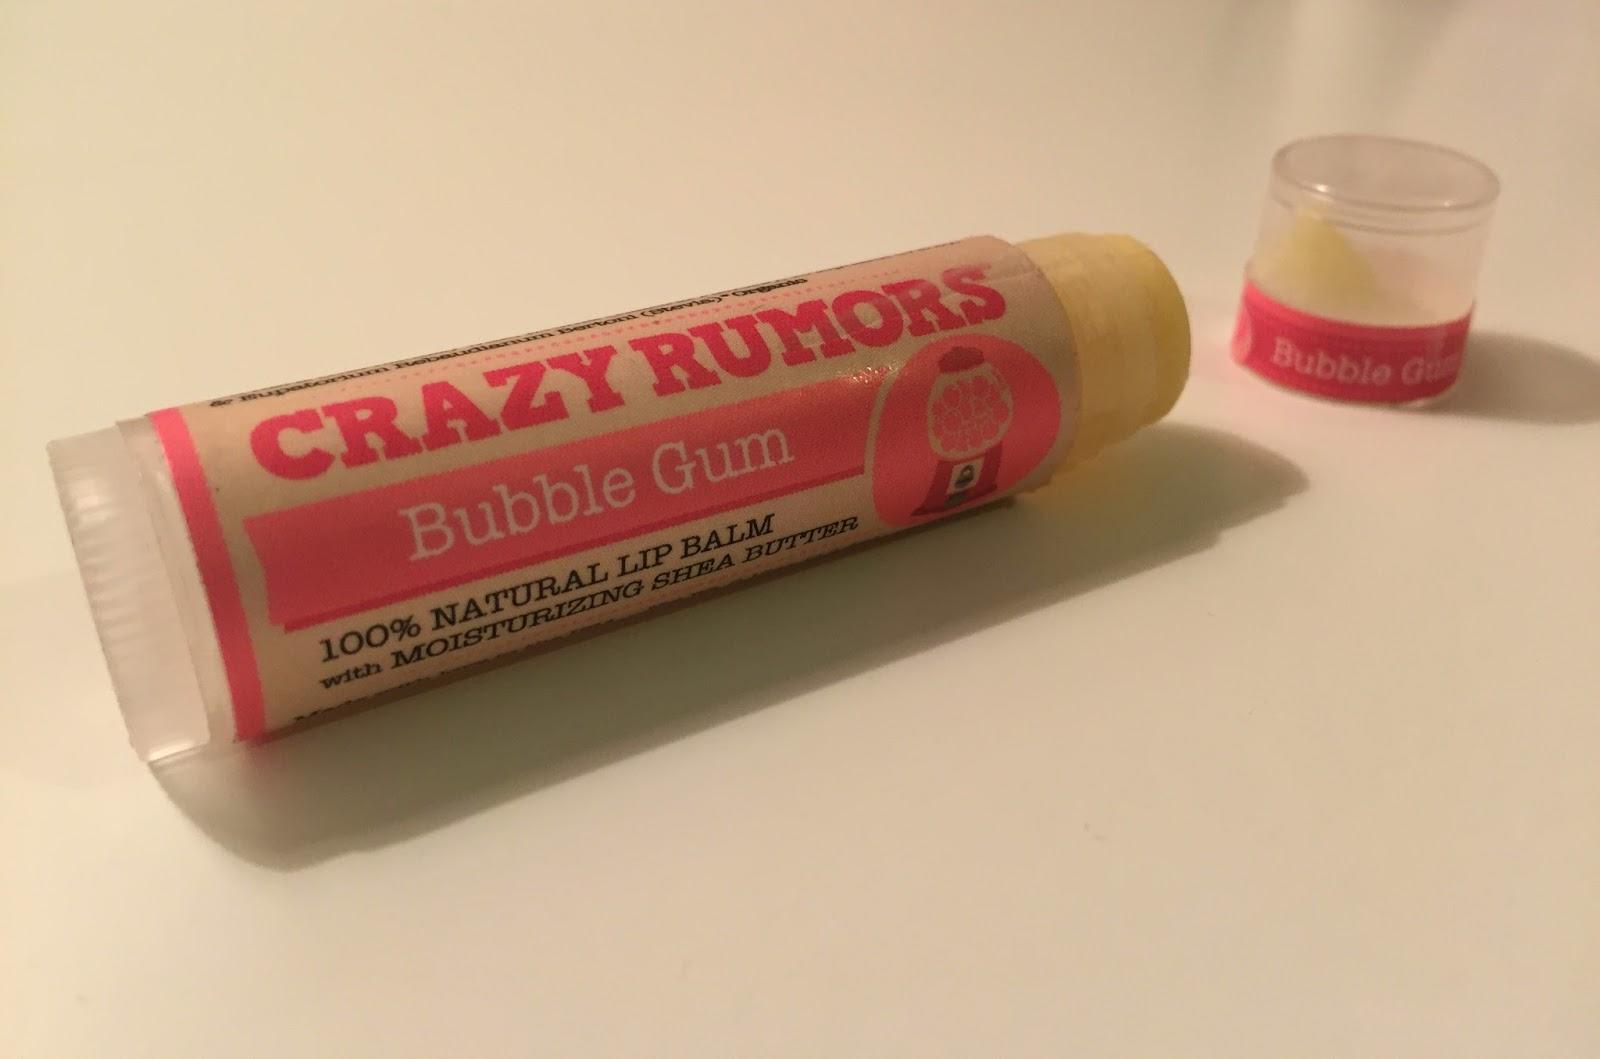 Crazy Rumors Bubble Gum Lip Balm